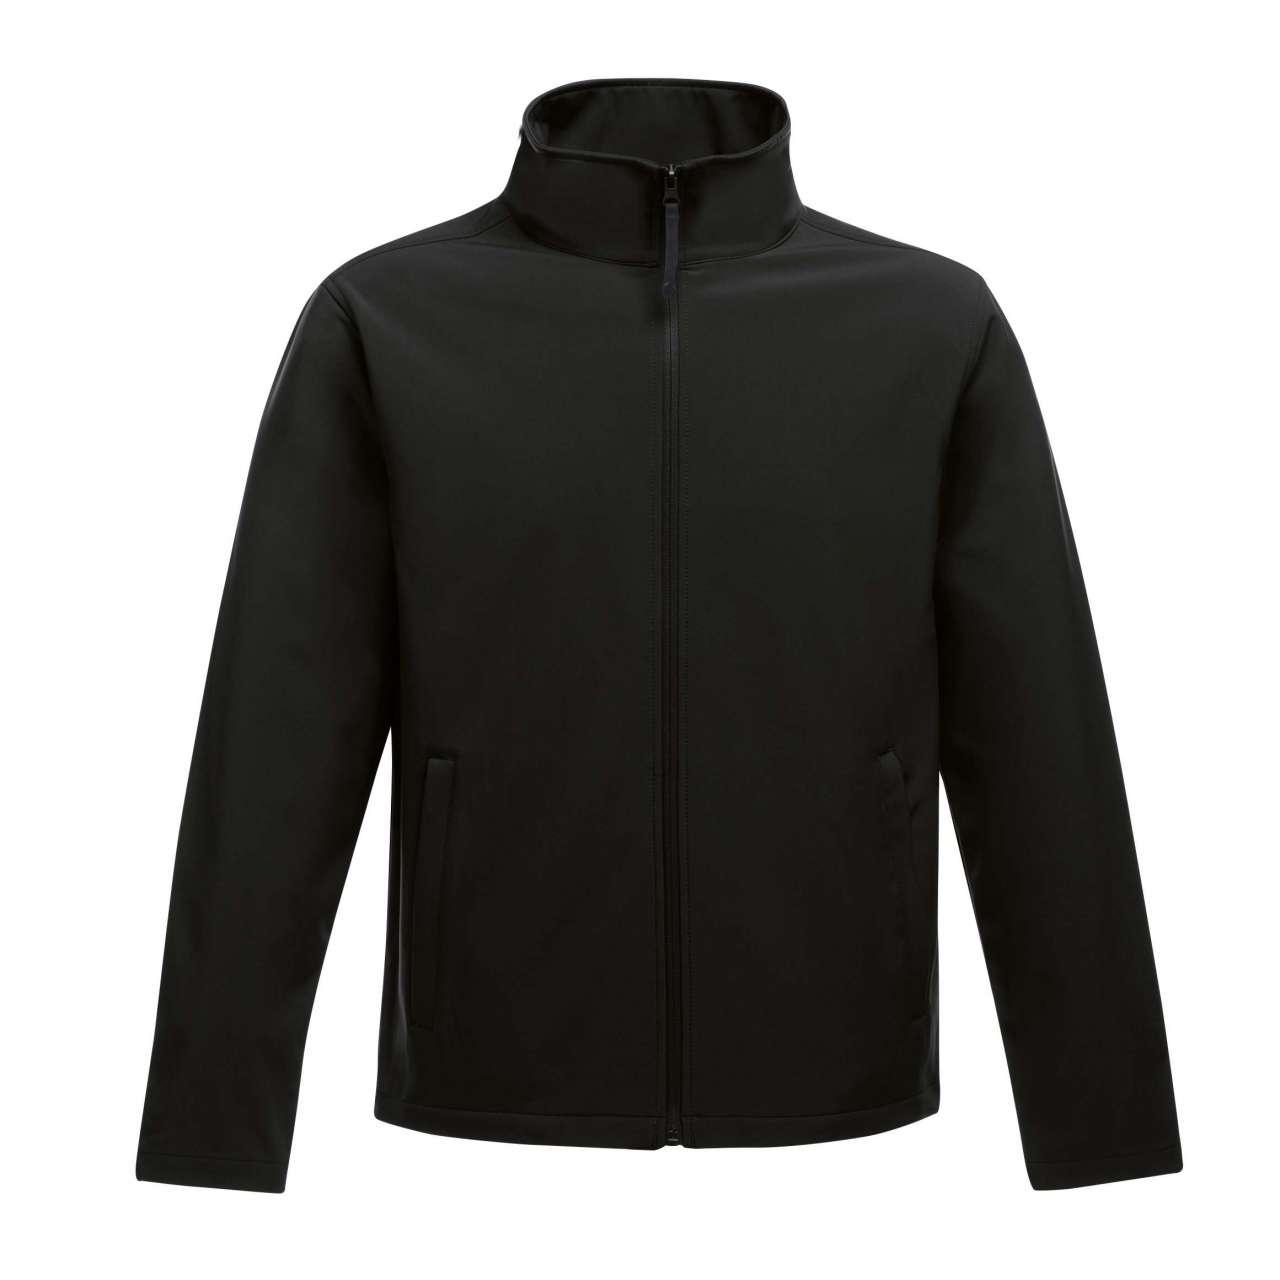 Softshell RETRA628 negru Veste jachete dama barbatesti polar fleece softshell fas gluga ploaie vant broderie serigrafie termotransfer